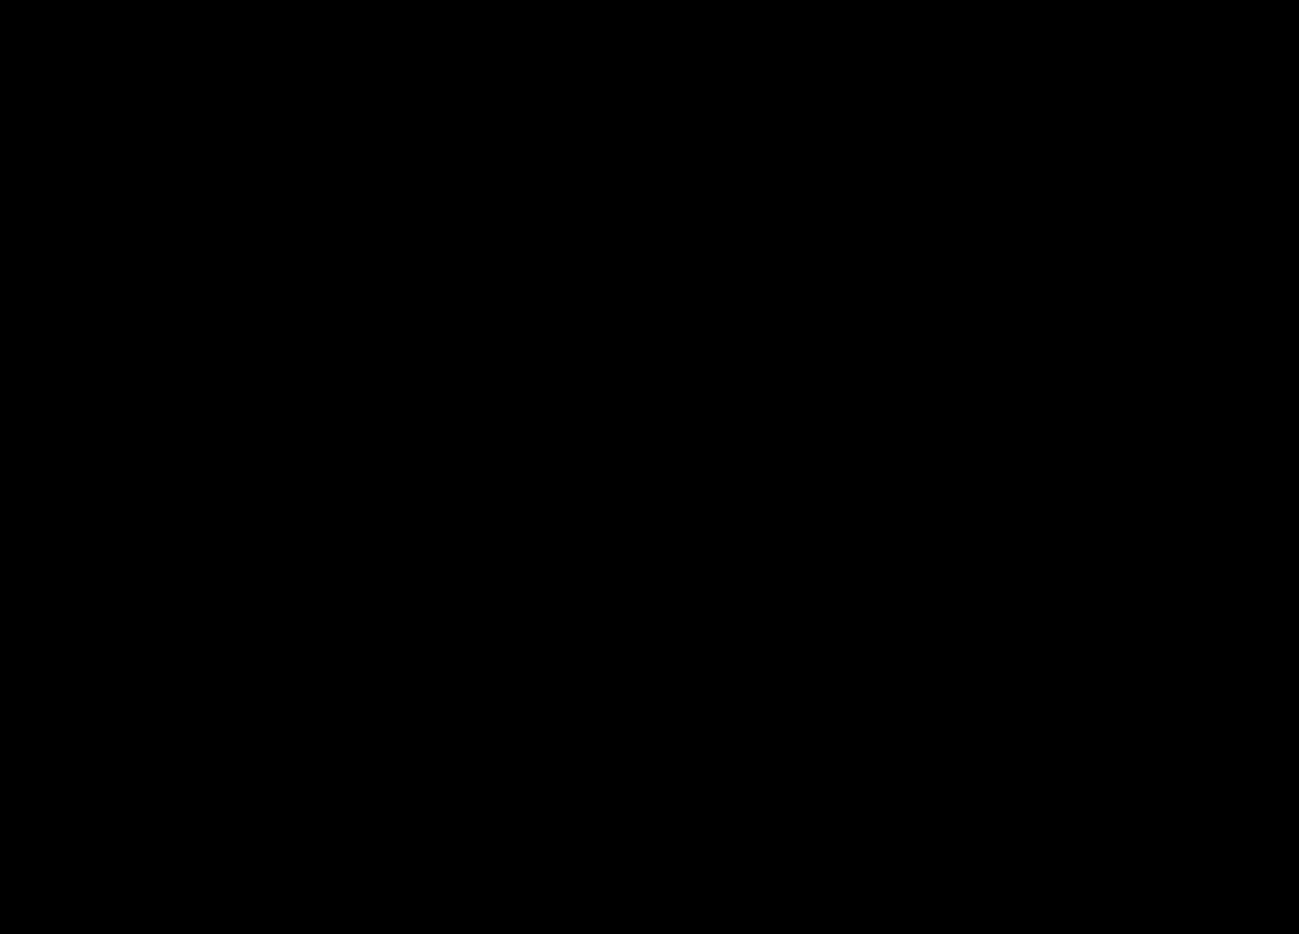 env-shapes